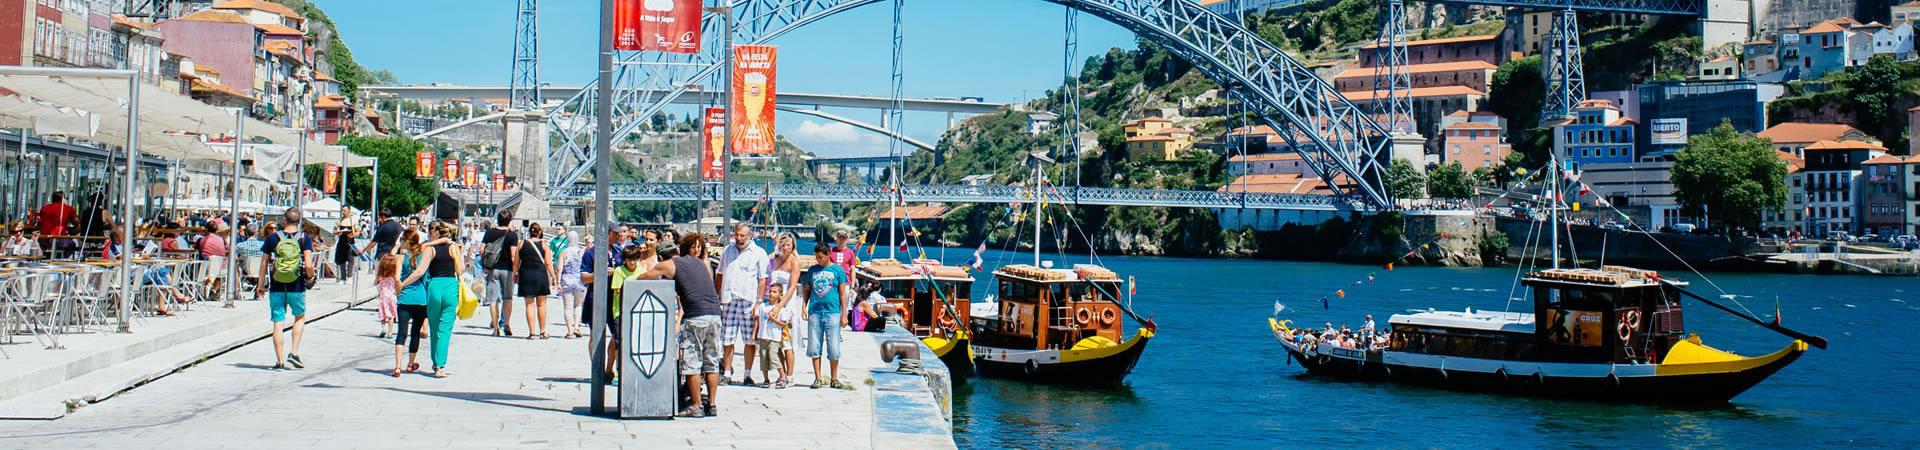 visitar no Porto